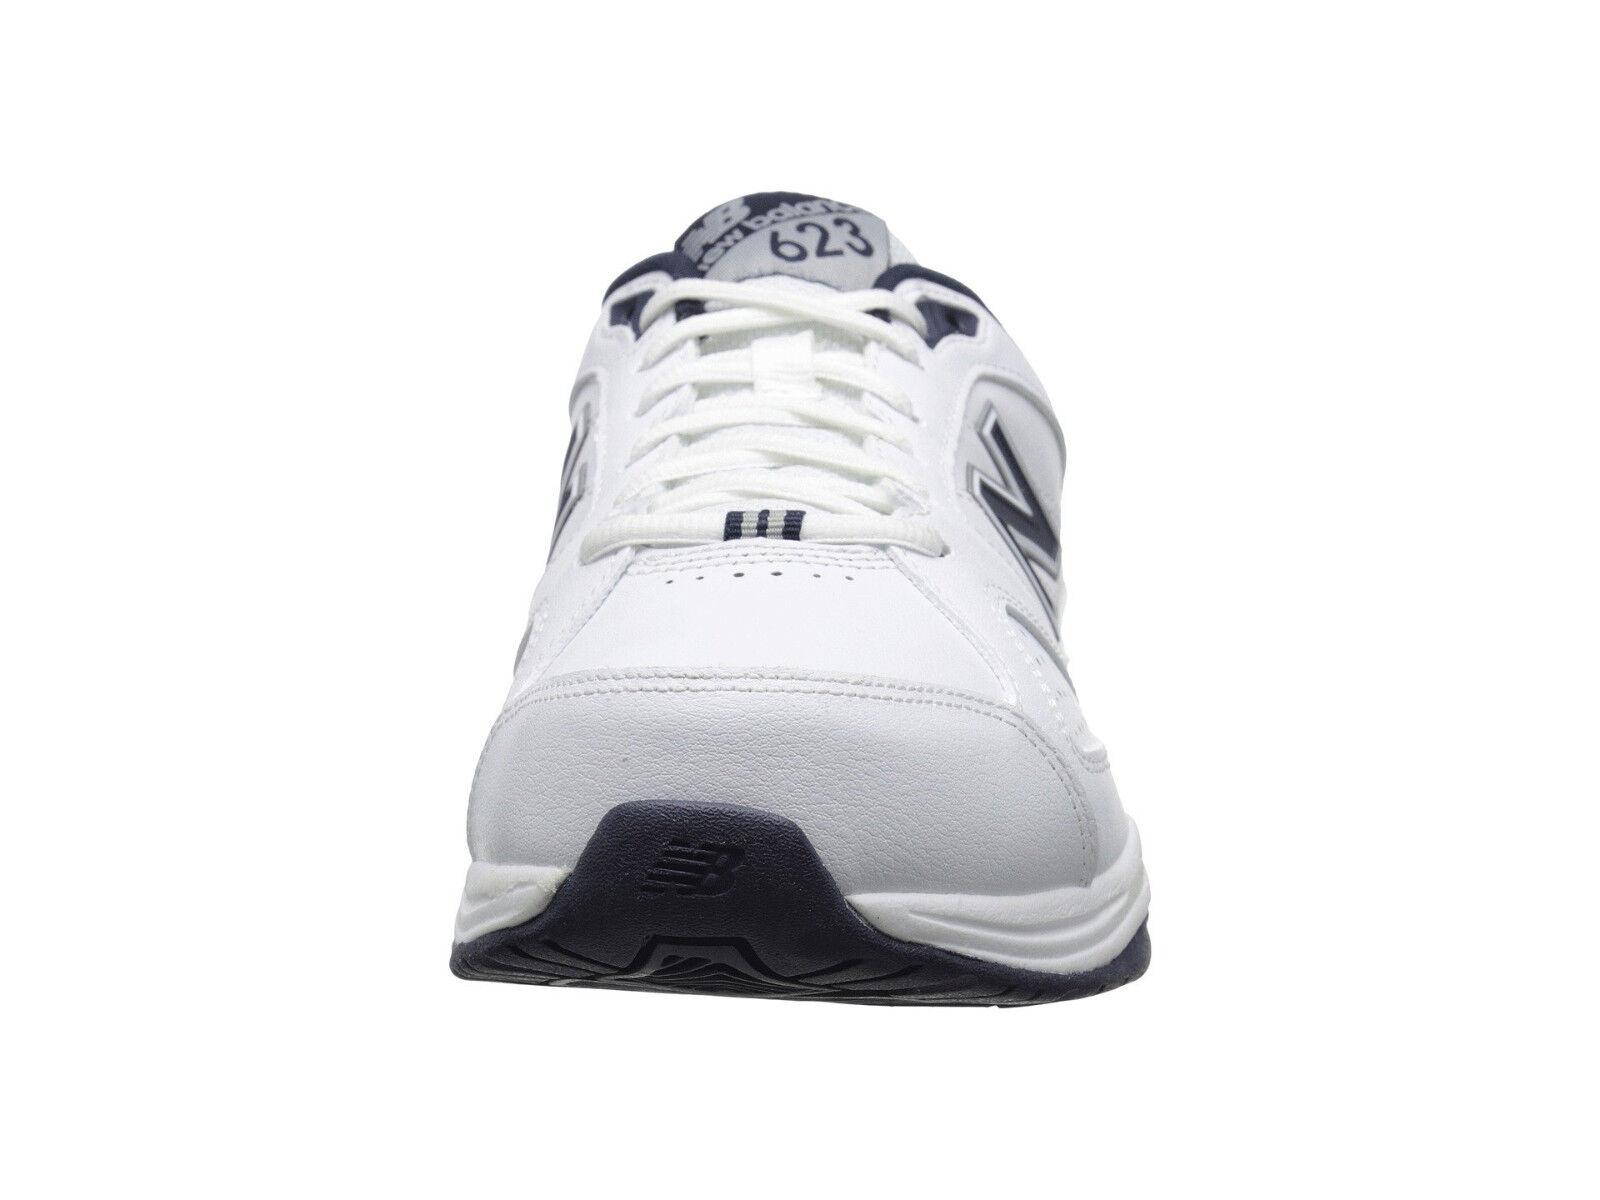 Men New Balance MX623WN3 Walking scarpe scarpe scarpe Medium D bianca Navy Leather 100%Authentic 20f0be